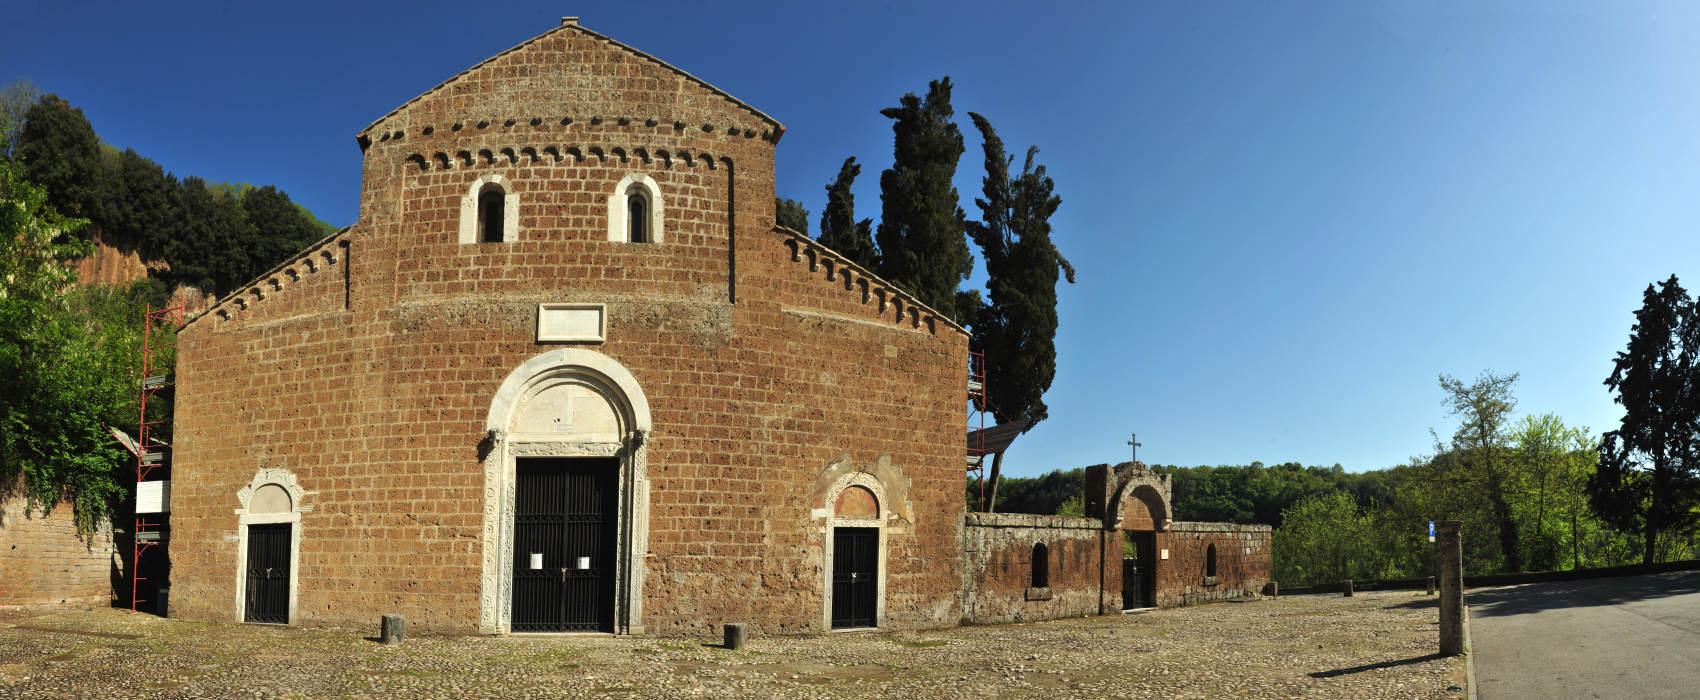 Orario apertura Basilica di Sant'Elia